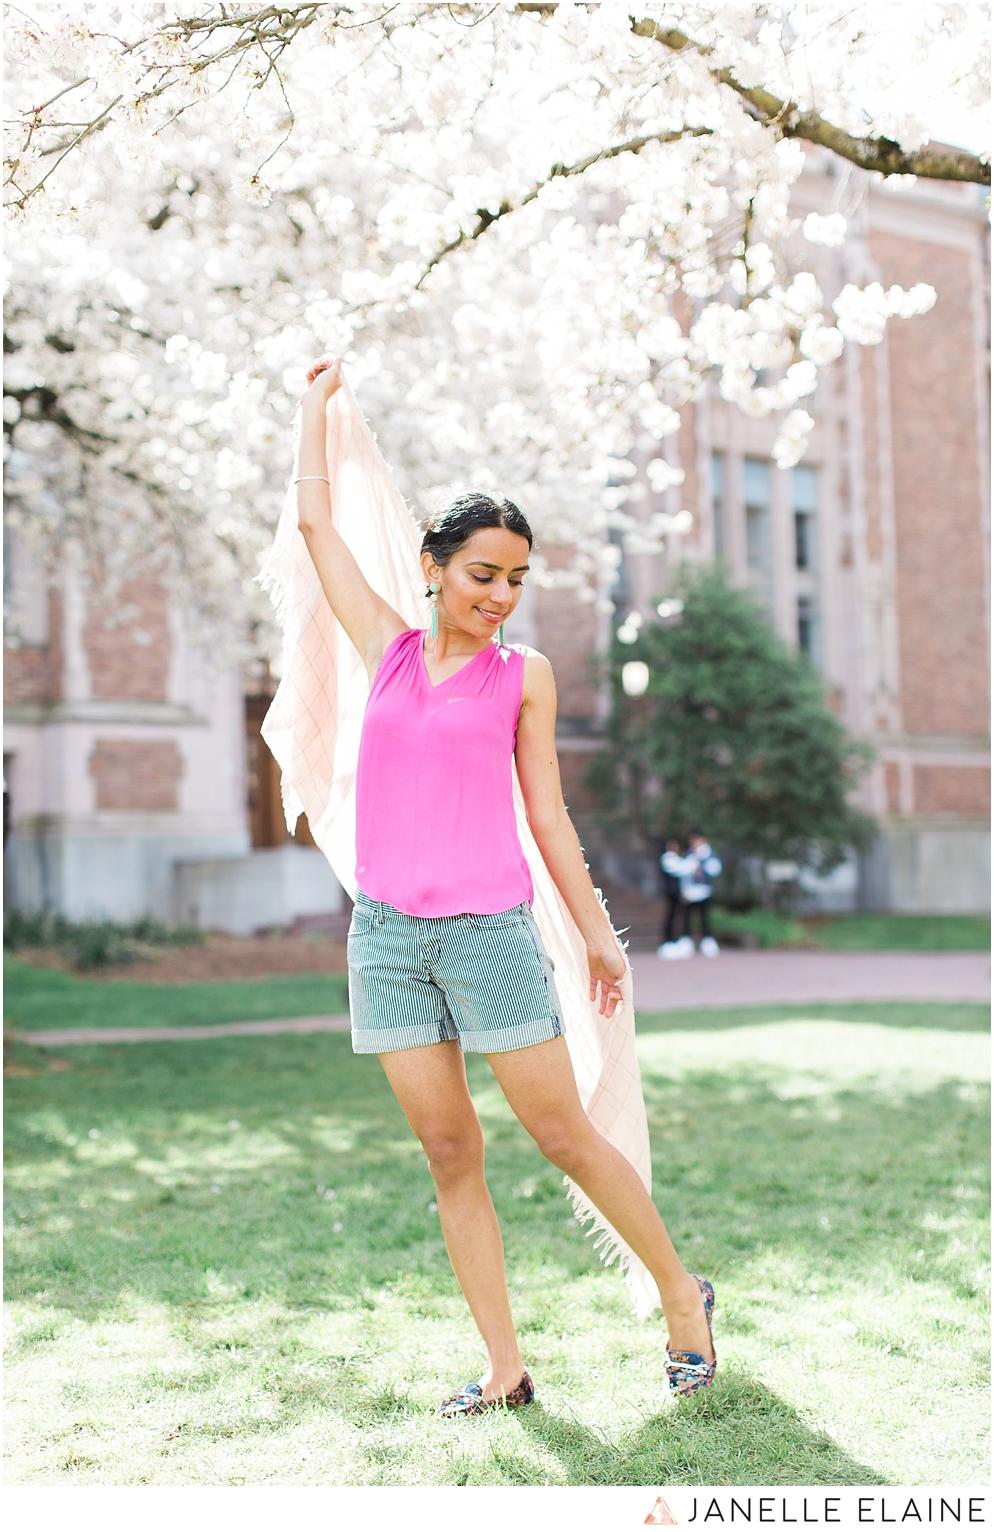 Sufience-Harkirat-spring portrait session-cherry blossoms-uw-seattle photographer janelle elaine-94.jpg